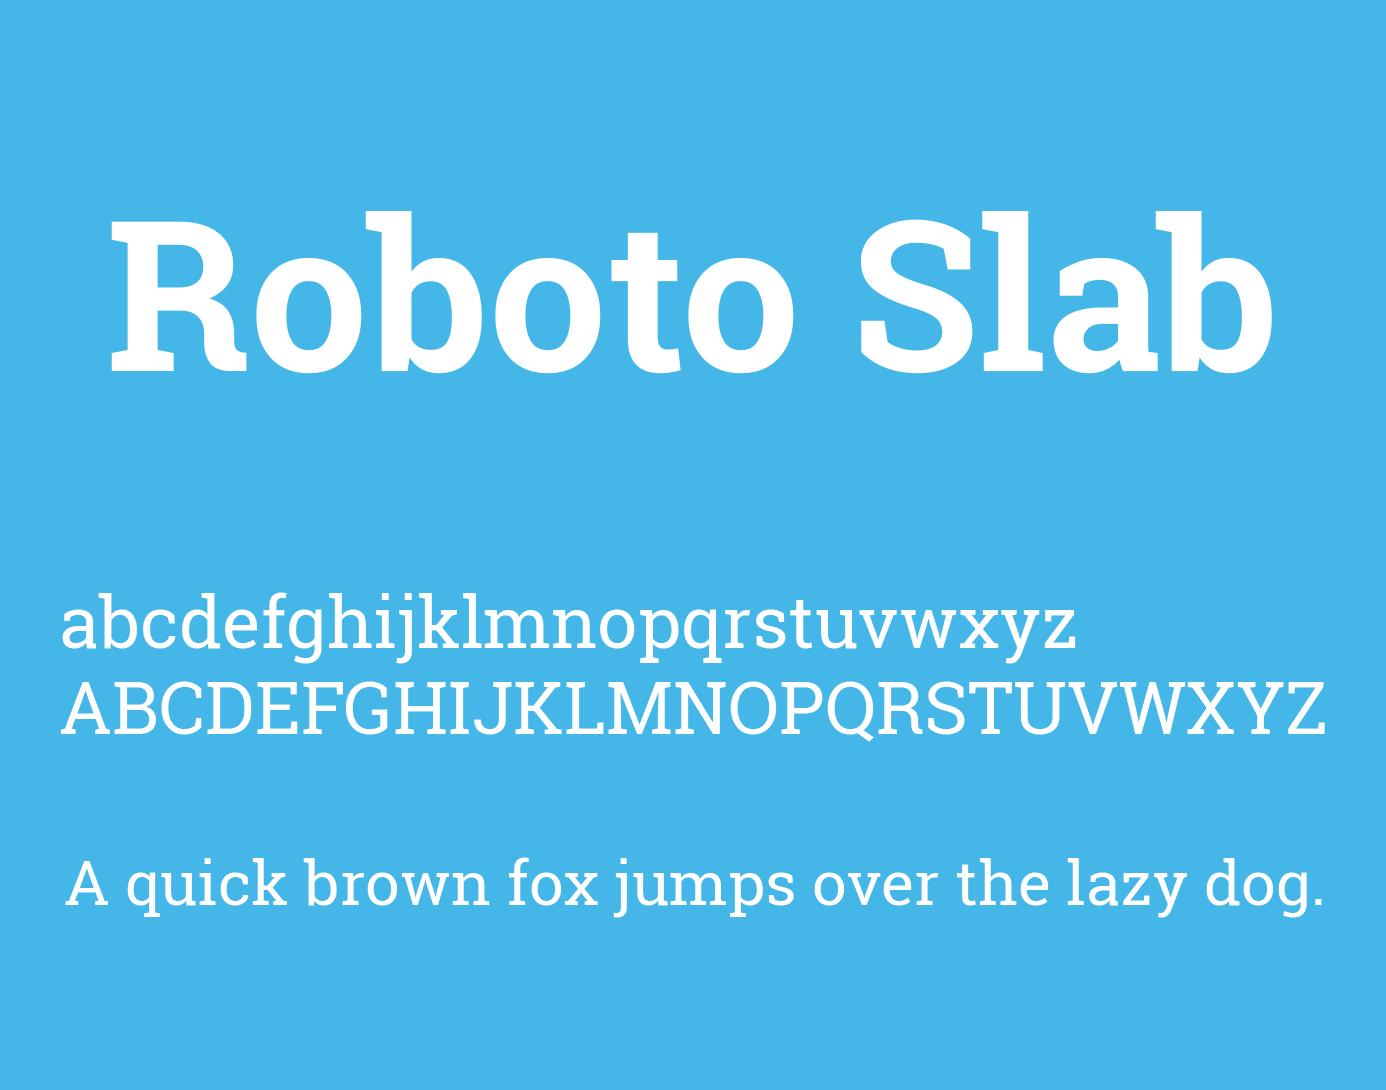 Roboto Slab Font Free Download | Fonts | Free fonts download, Fonts